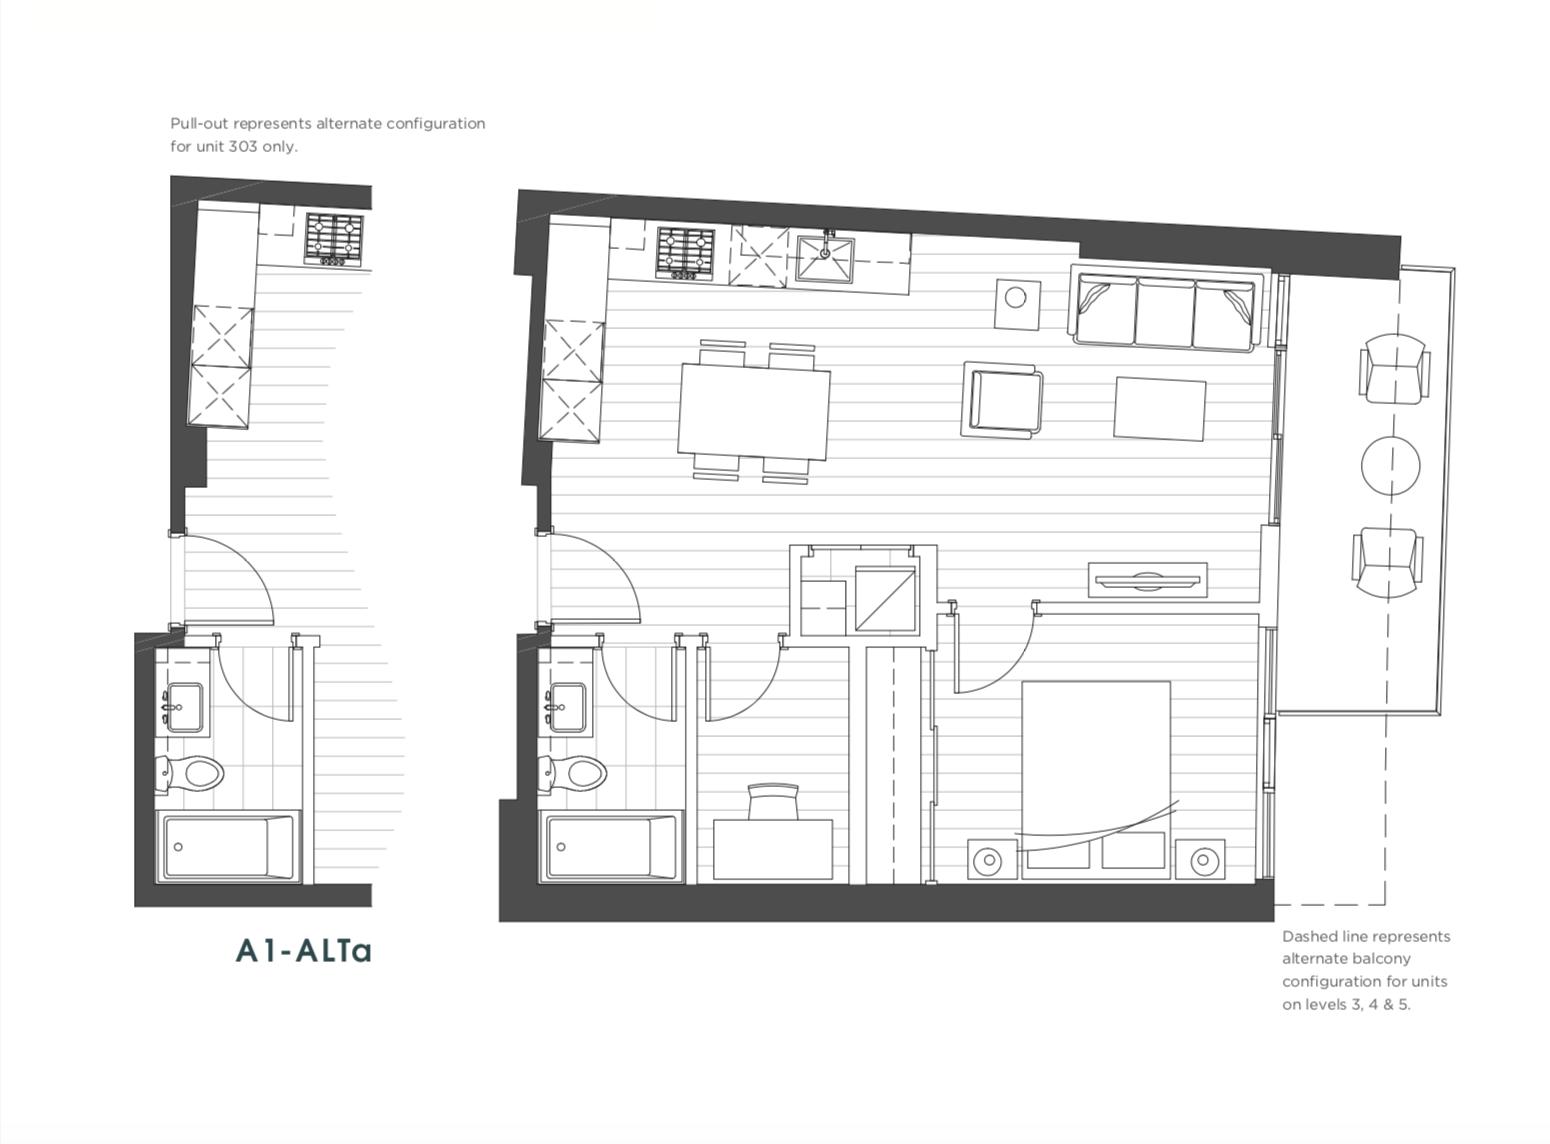 Picasso Unit 0419 - 1 Bedroom